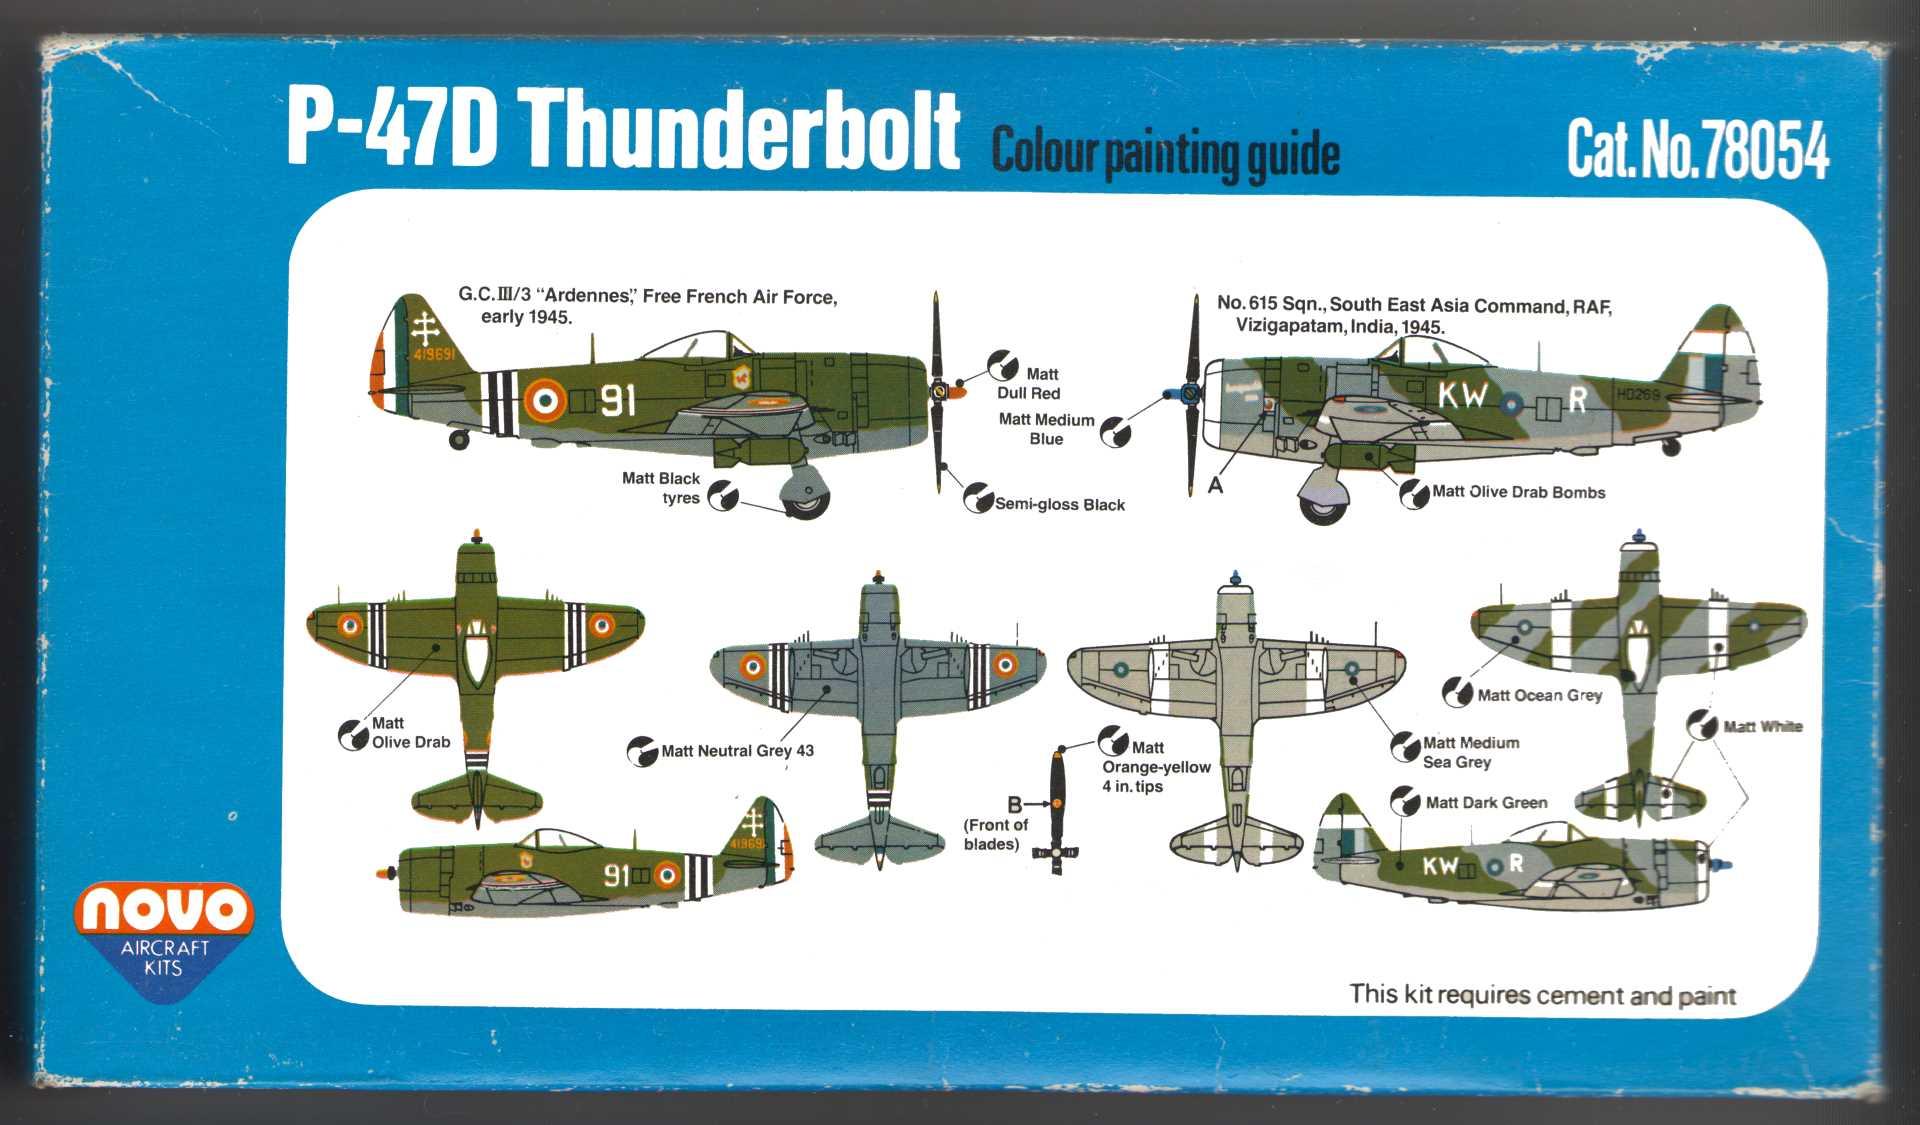 Руководство по окраске NOVO F183 Thunderbolt - Fighter Bomber на нижней части коробки